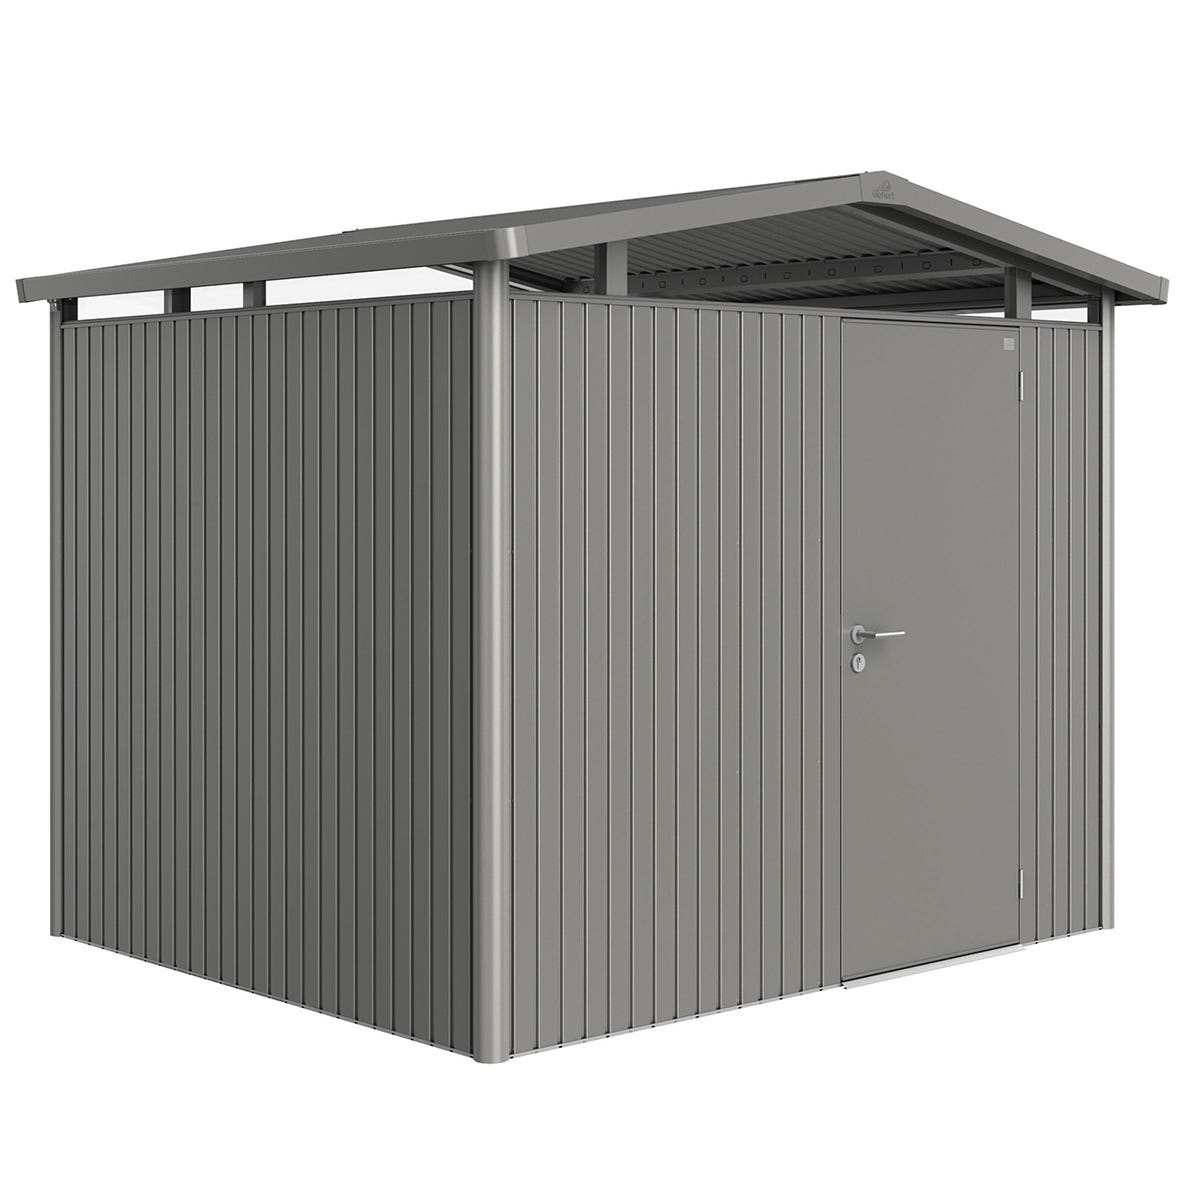 Biohort Panorama Metal Shed P3 Standard Door 9' x 7' 8'' - Quartz Grey